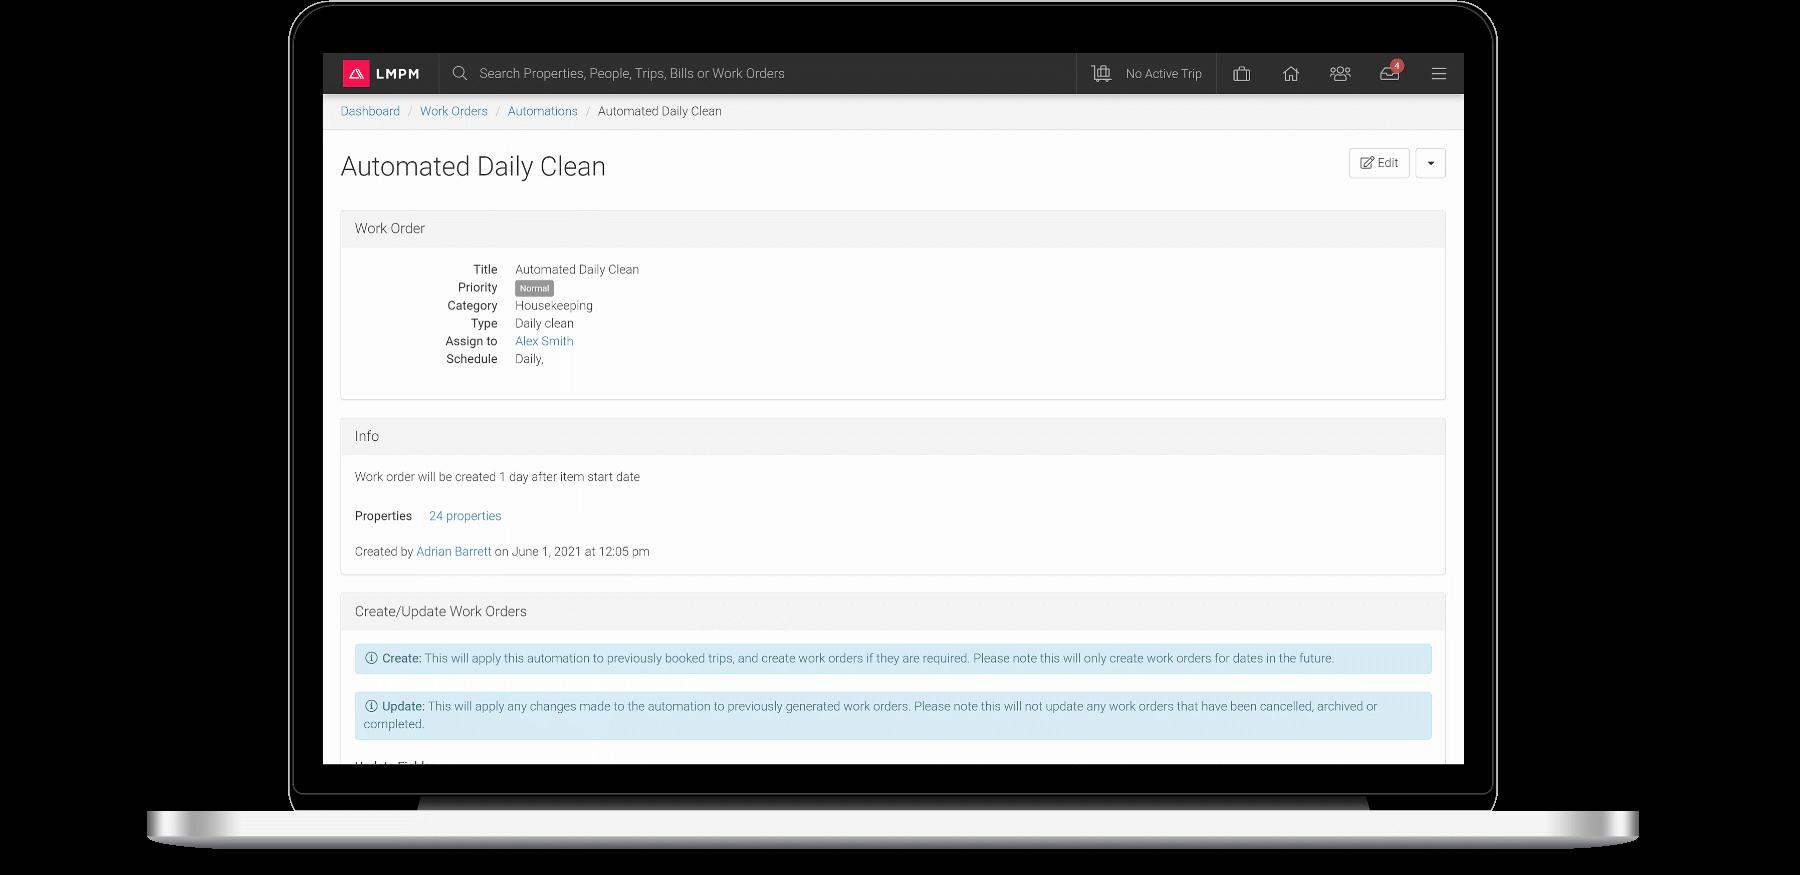 screenshot of LMPM's work order automation